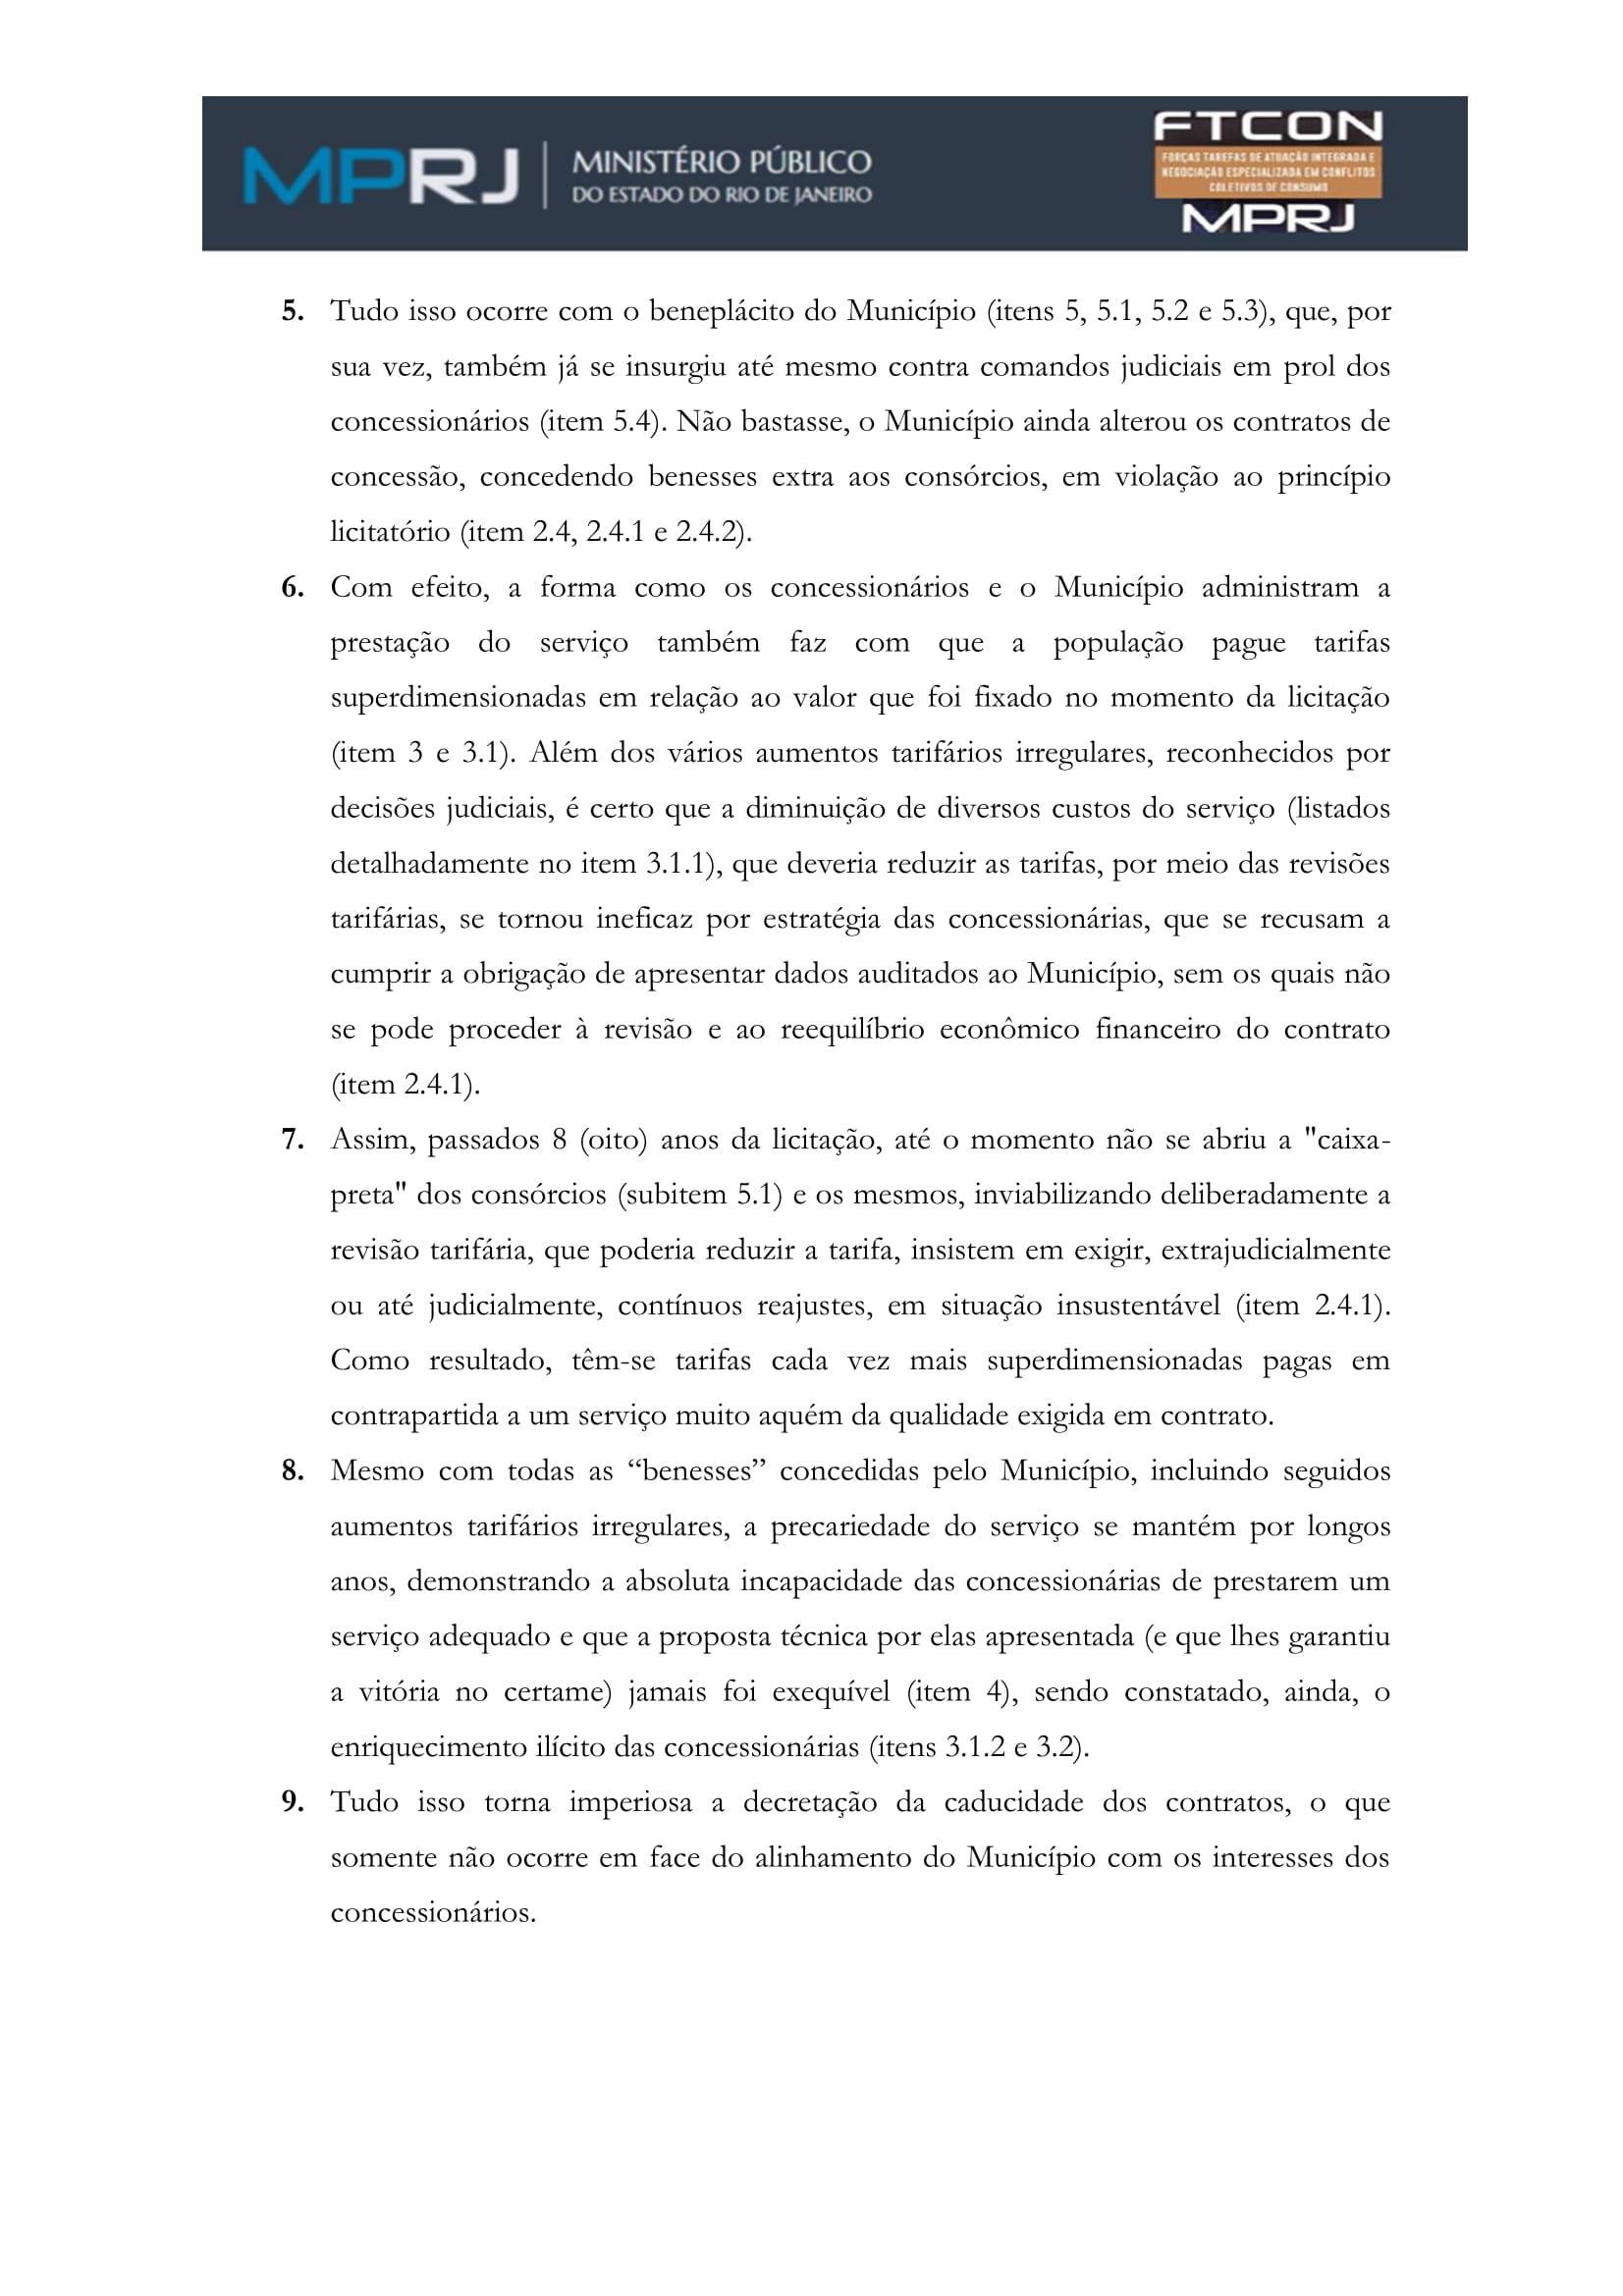 acp_caducidade_onibus_dr_rt-003